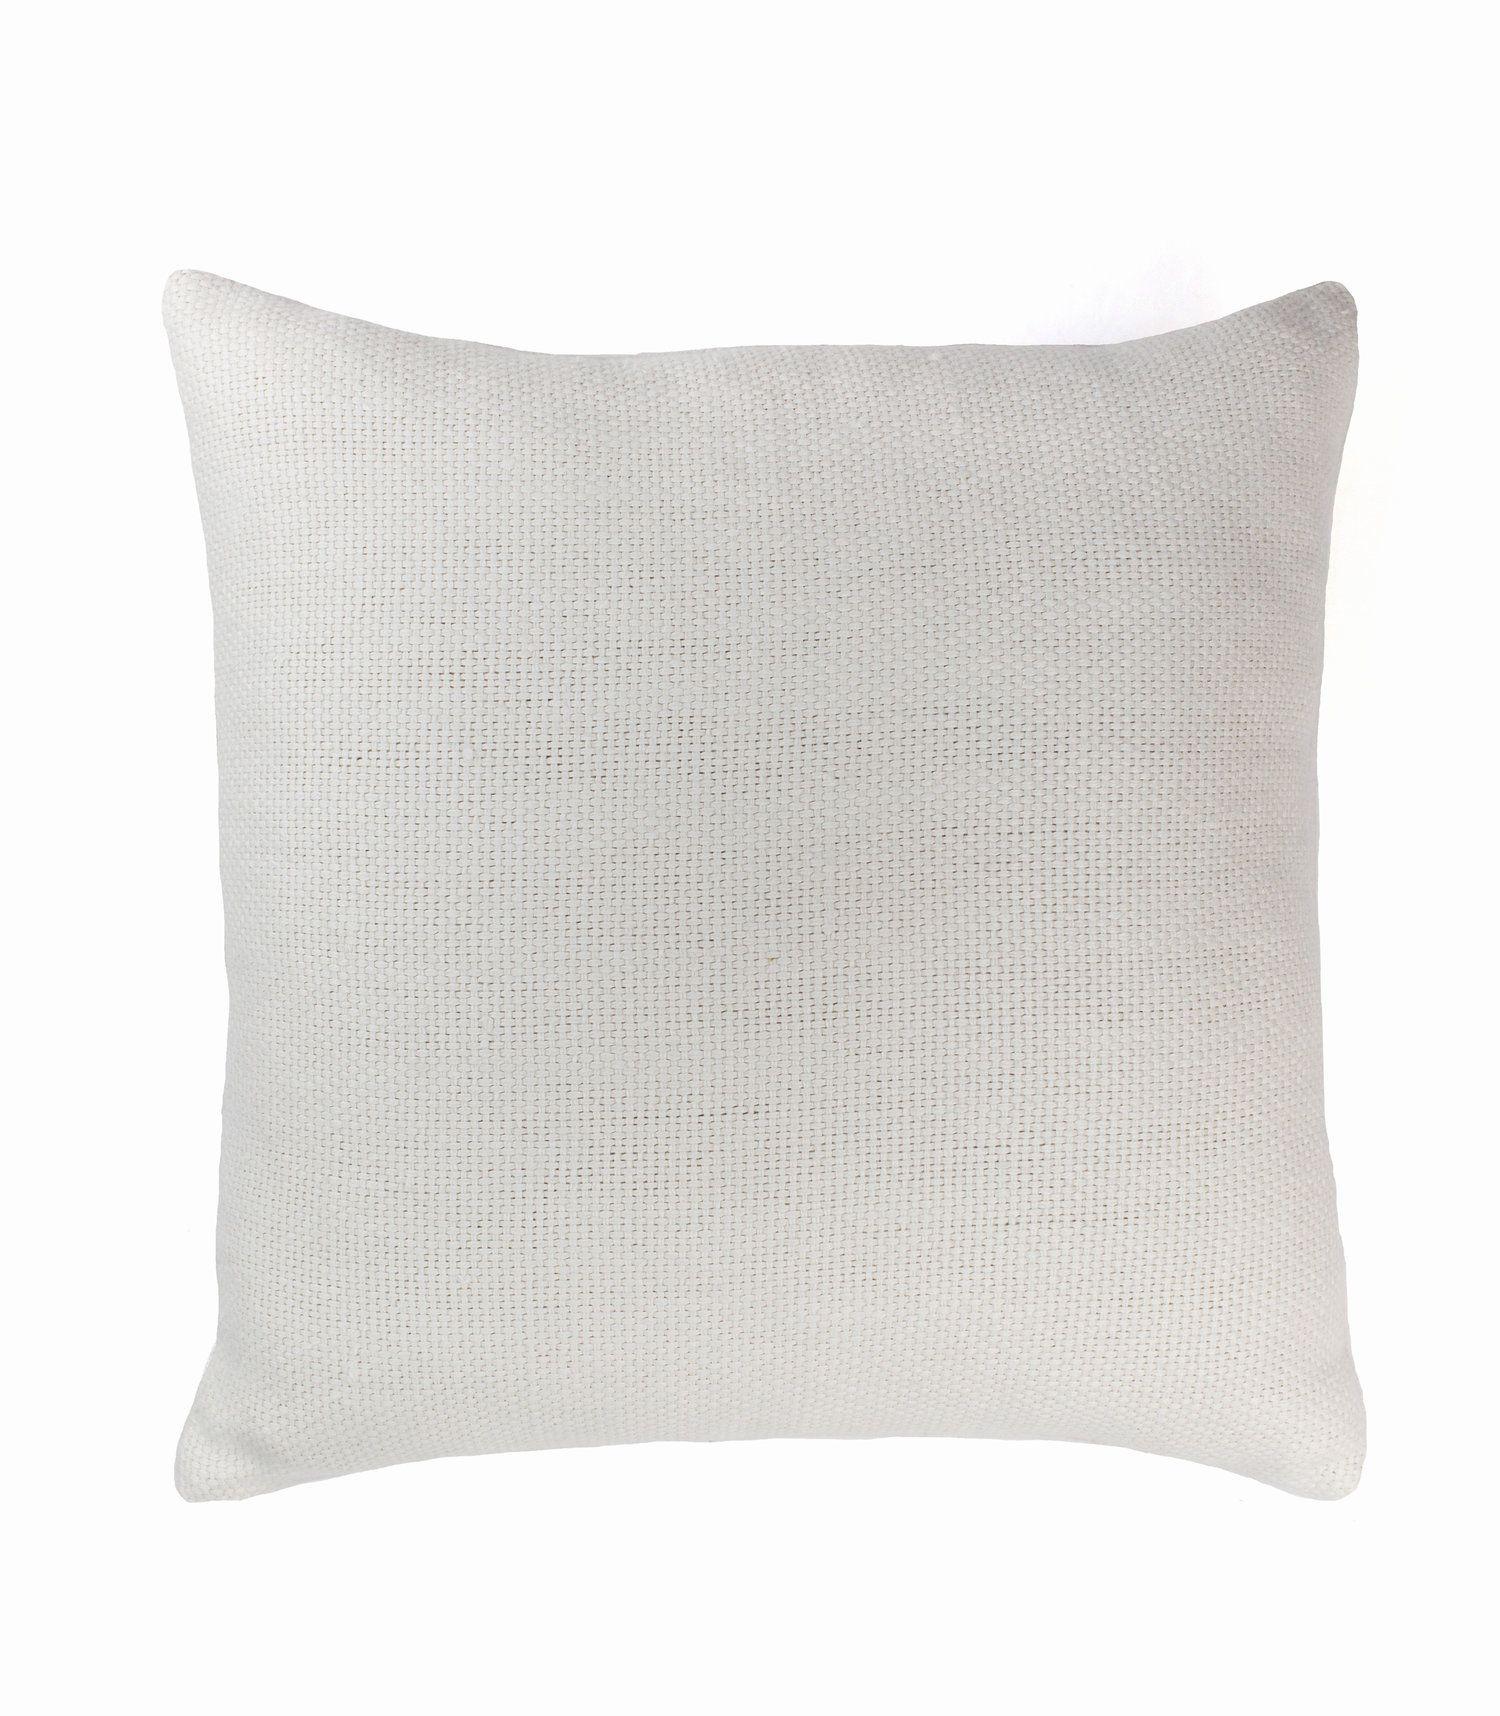 Hugo Linen baskets, Basket weaving, Throw pillows